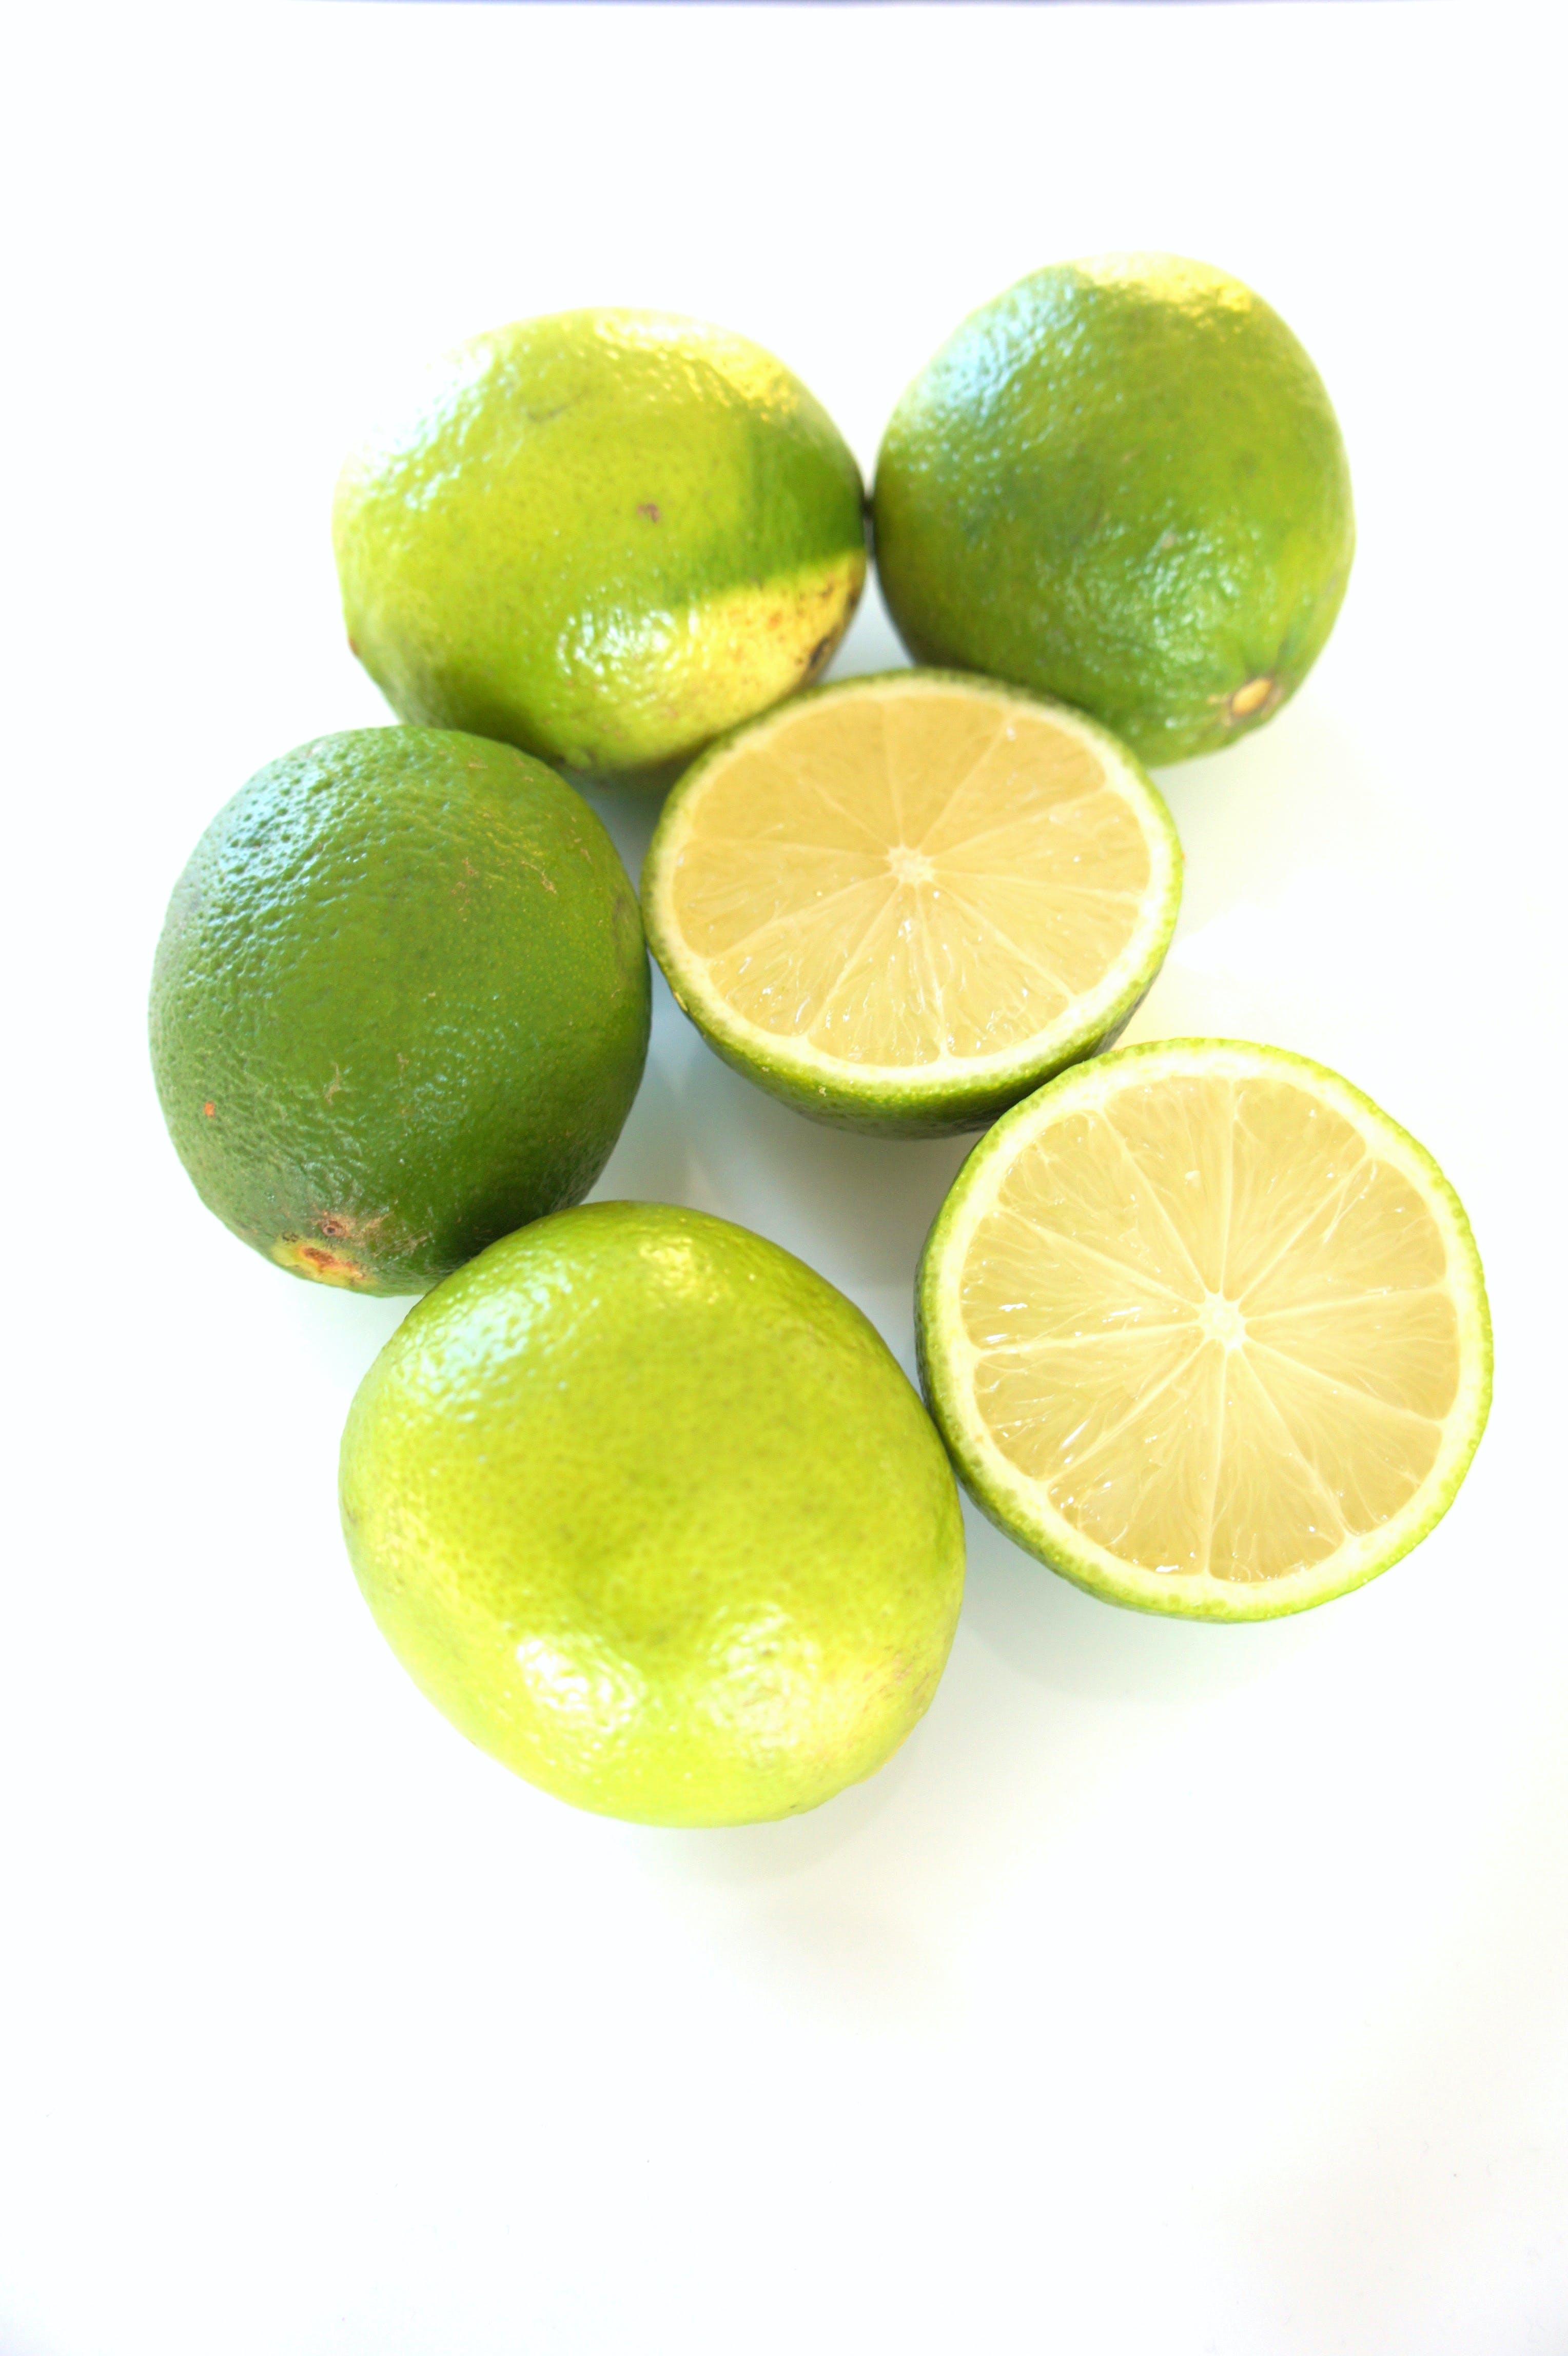 Fotos de stock gratuitas de Citroen, comida, frutas